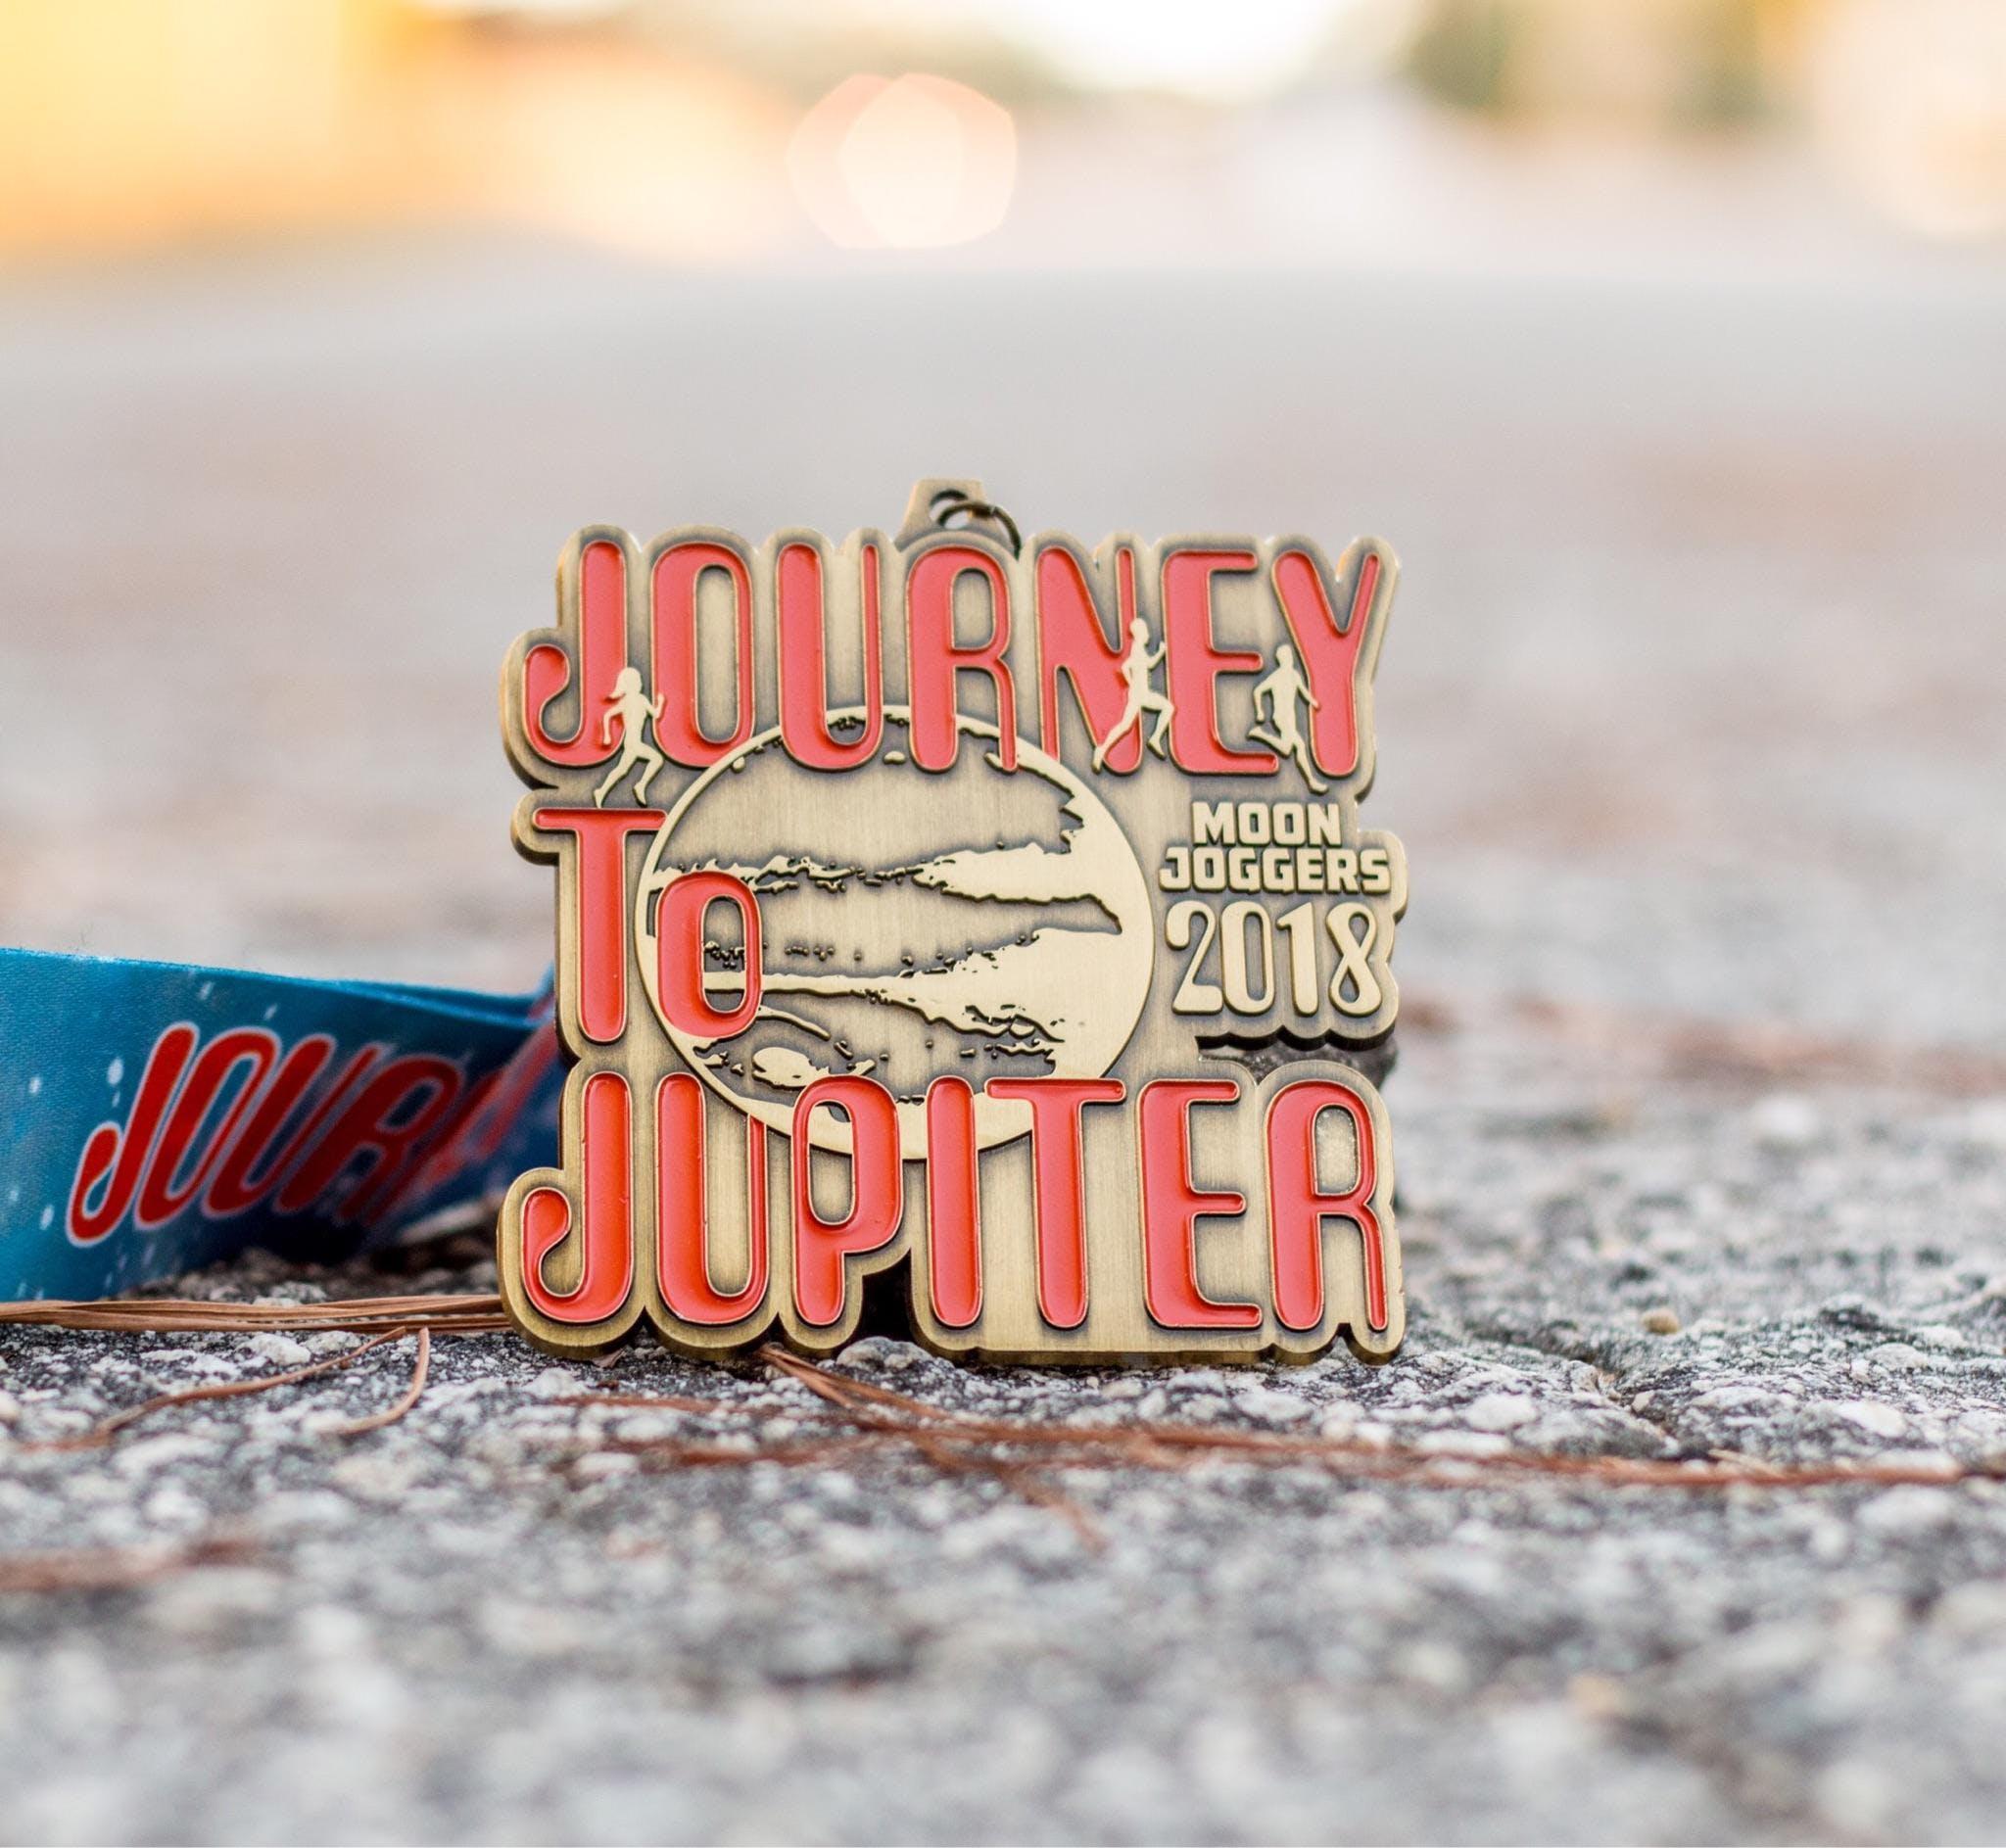 Only $12! Journey to Jupiter Running & Walking Challenge -Chandler